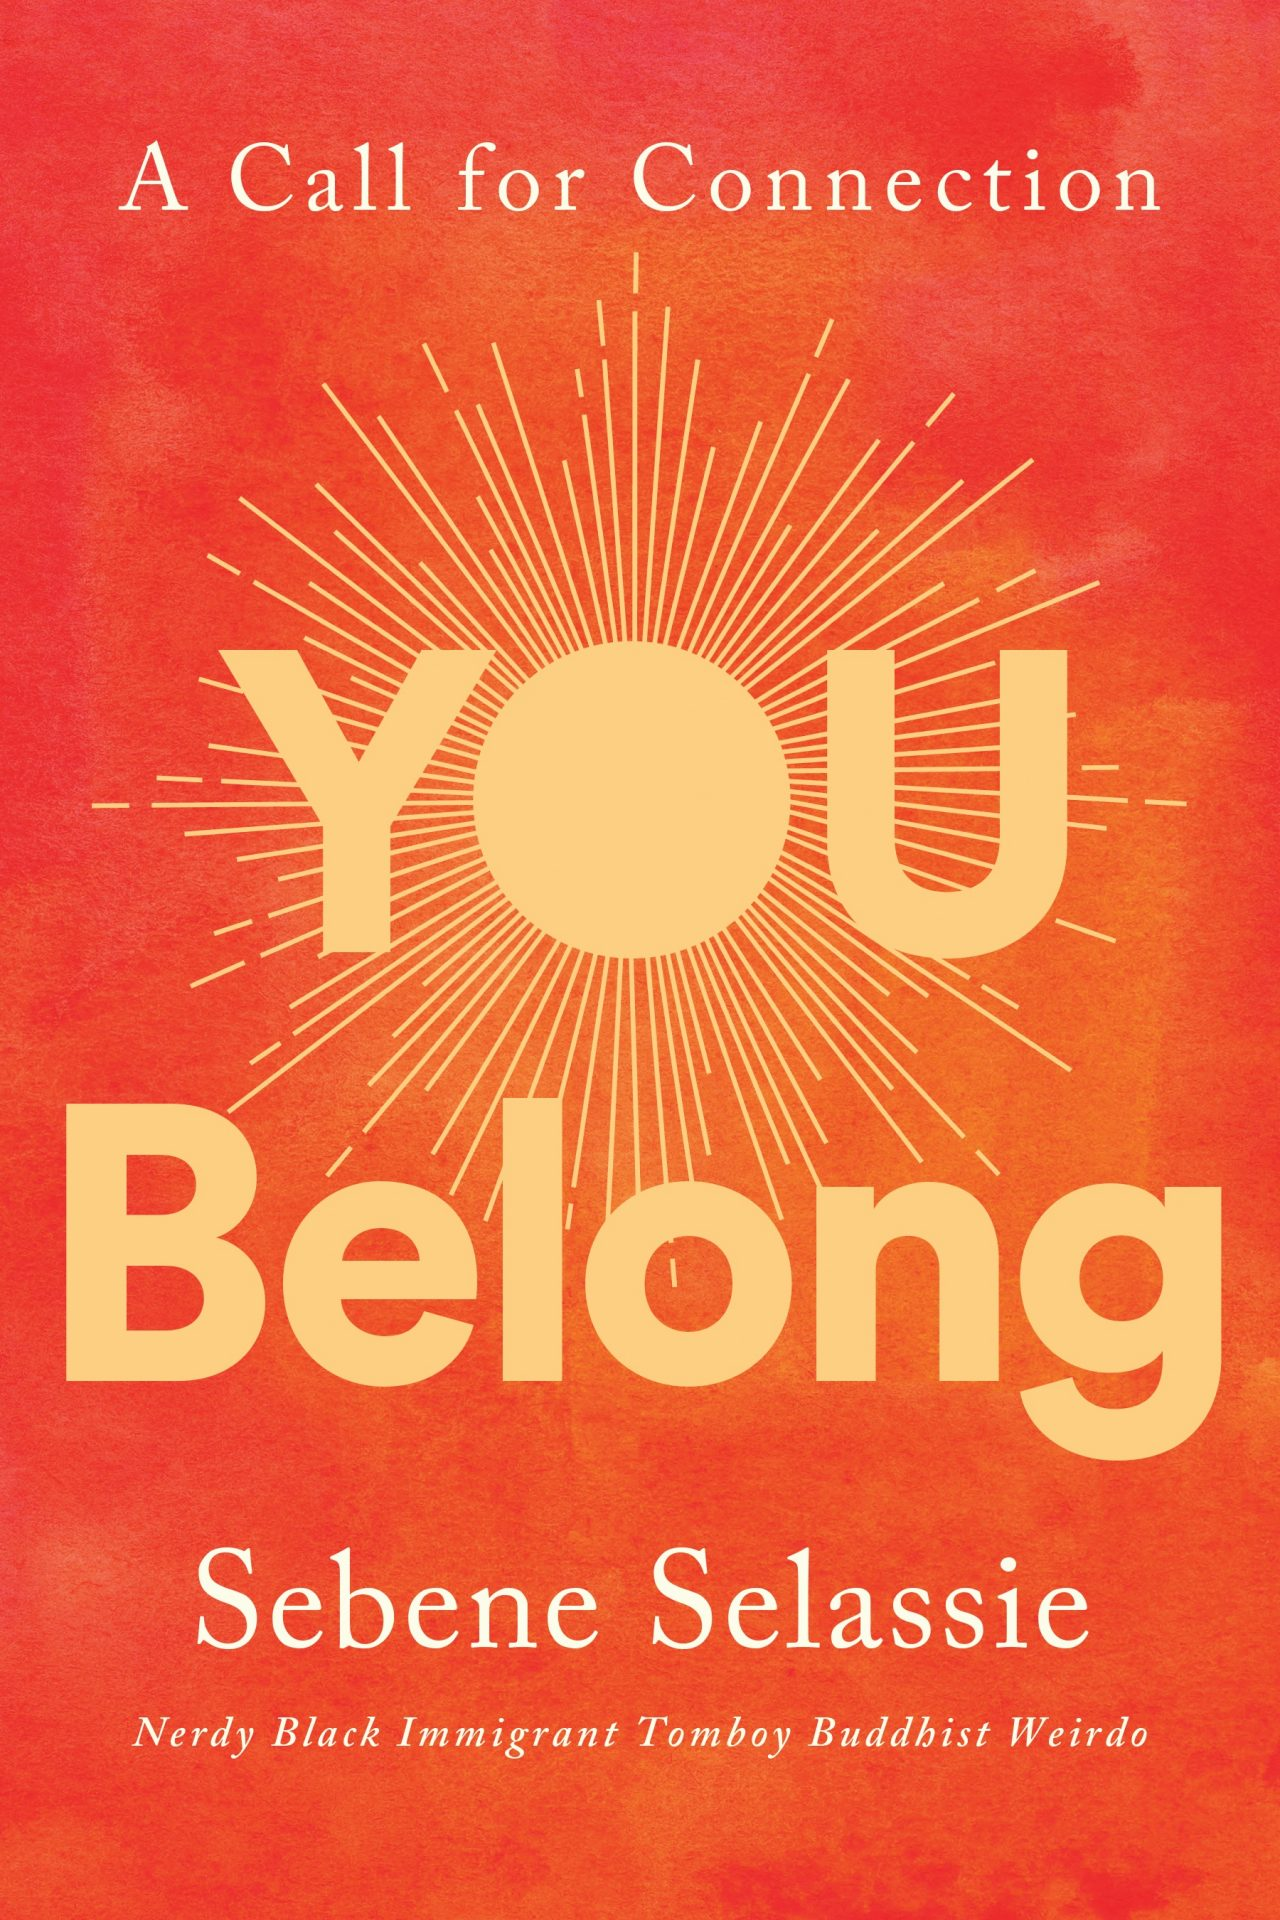 'You Belong' by Sebene Selassie